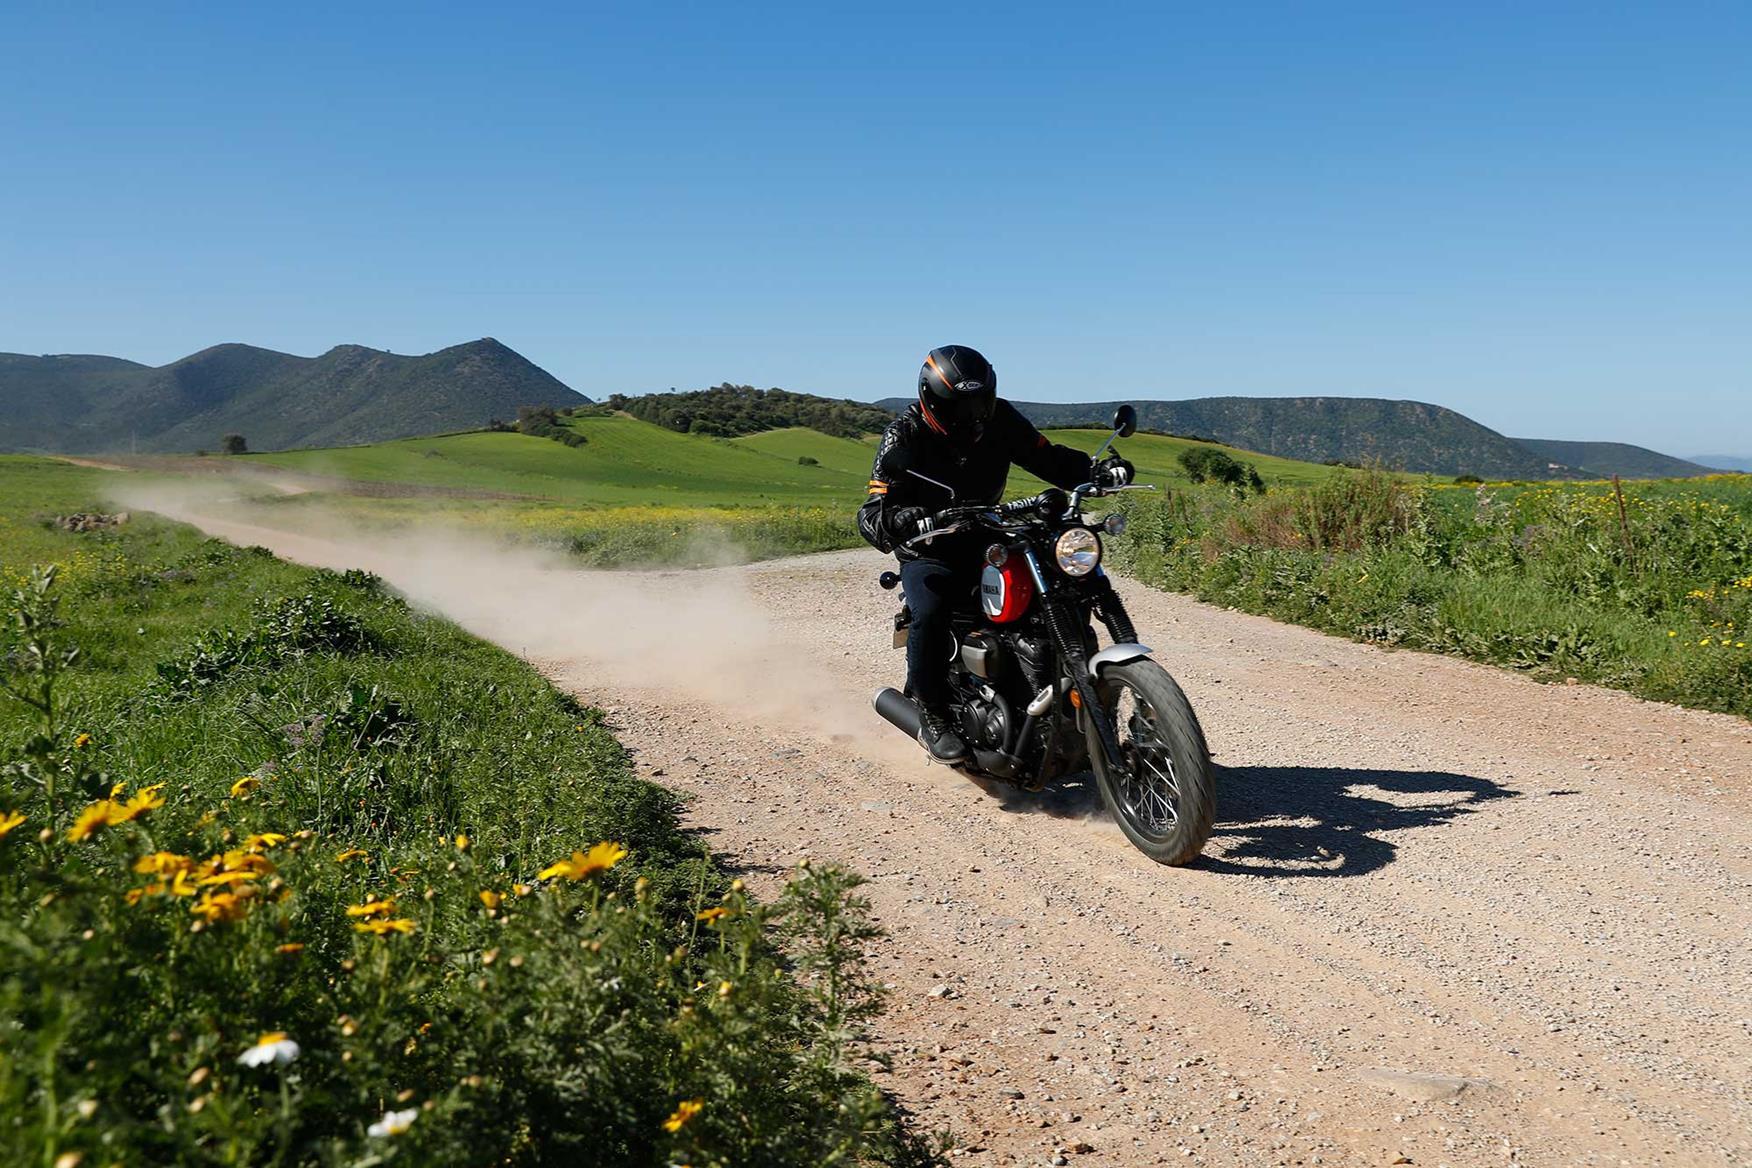 Yamaha SCR950 gravel